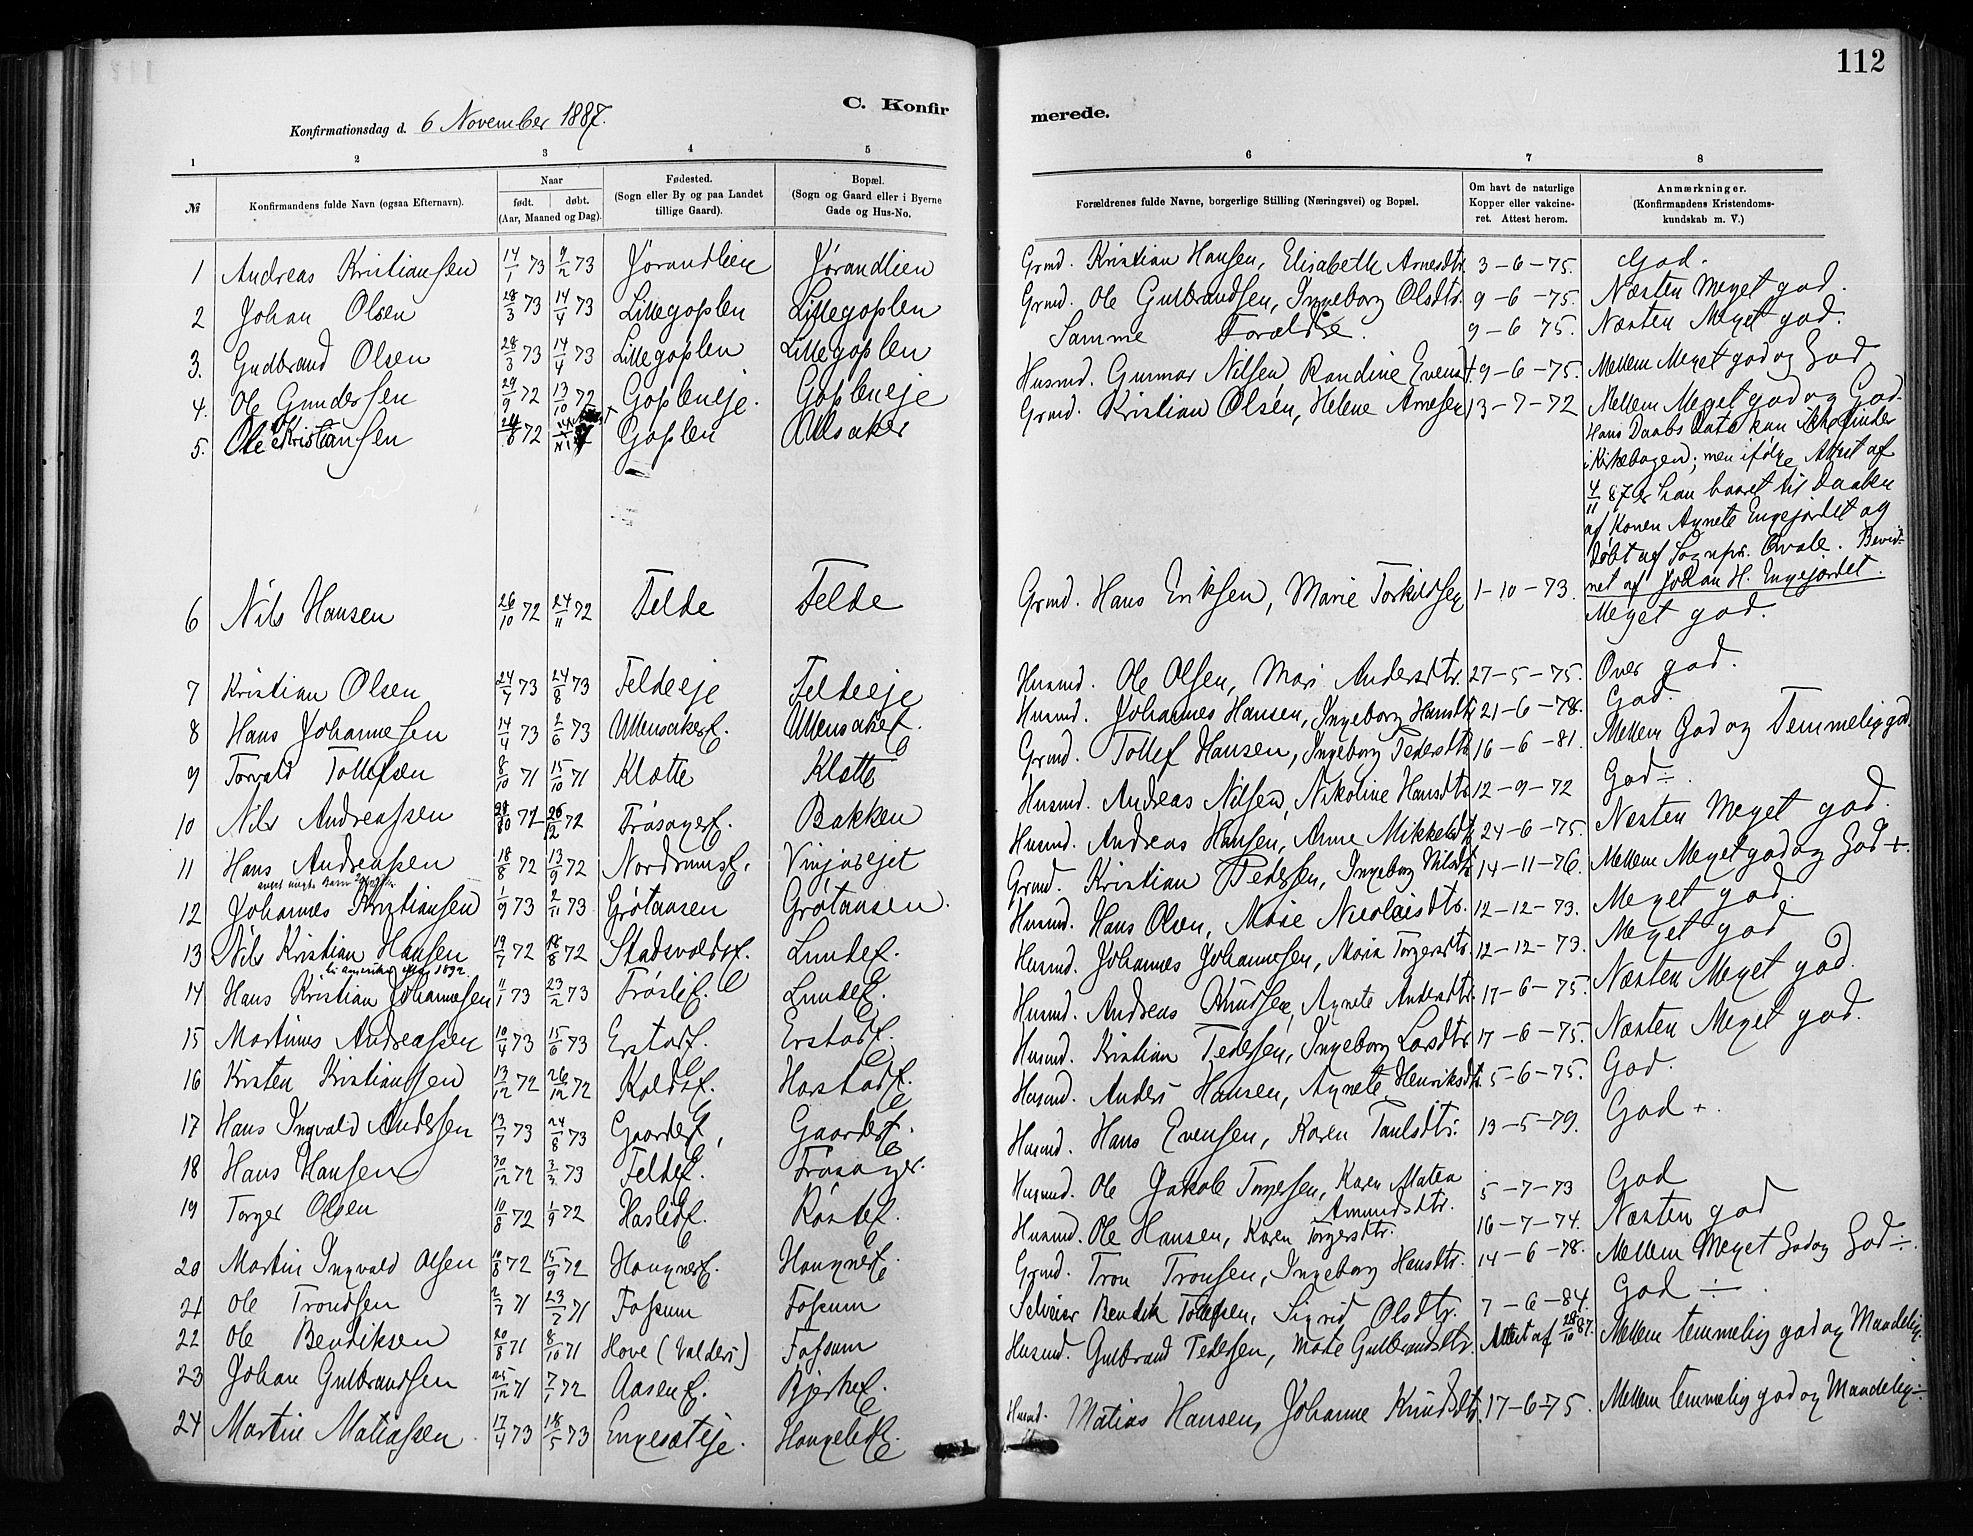 SAH, Nordre Land prestekontor, Ministerialbok nr. 4, 1882-1896, s. 112